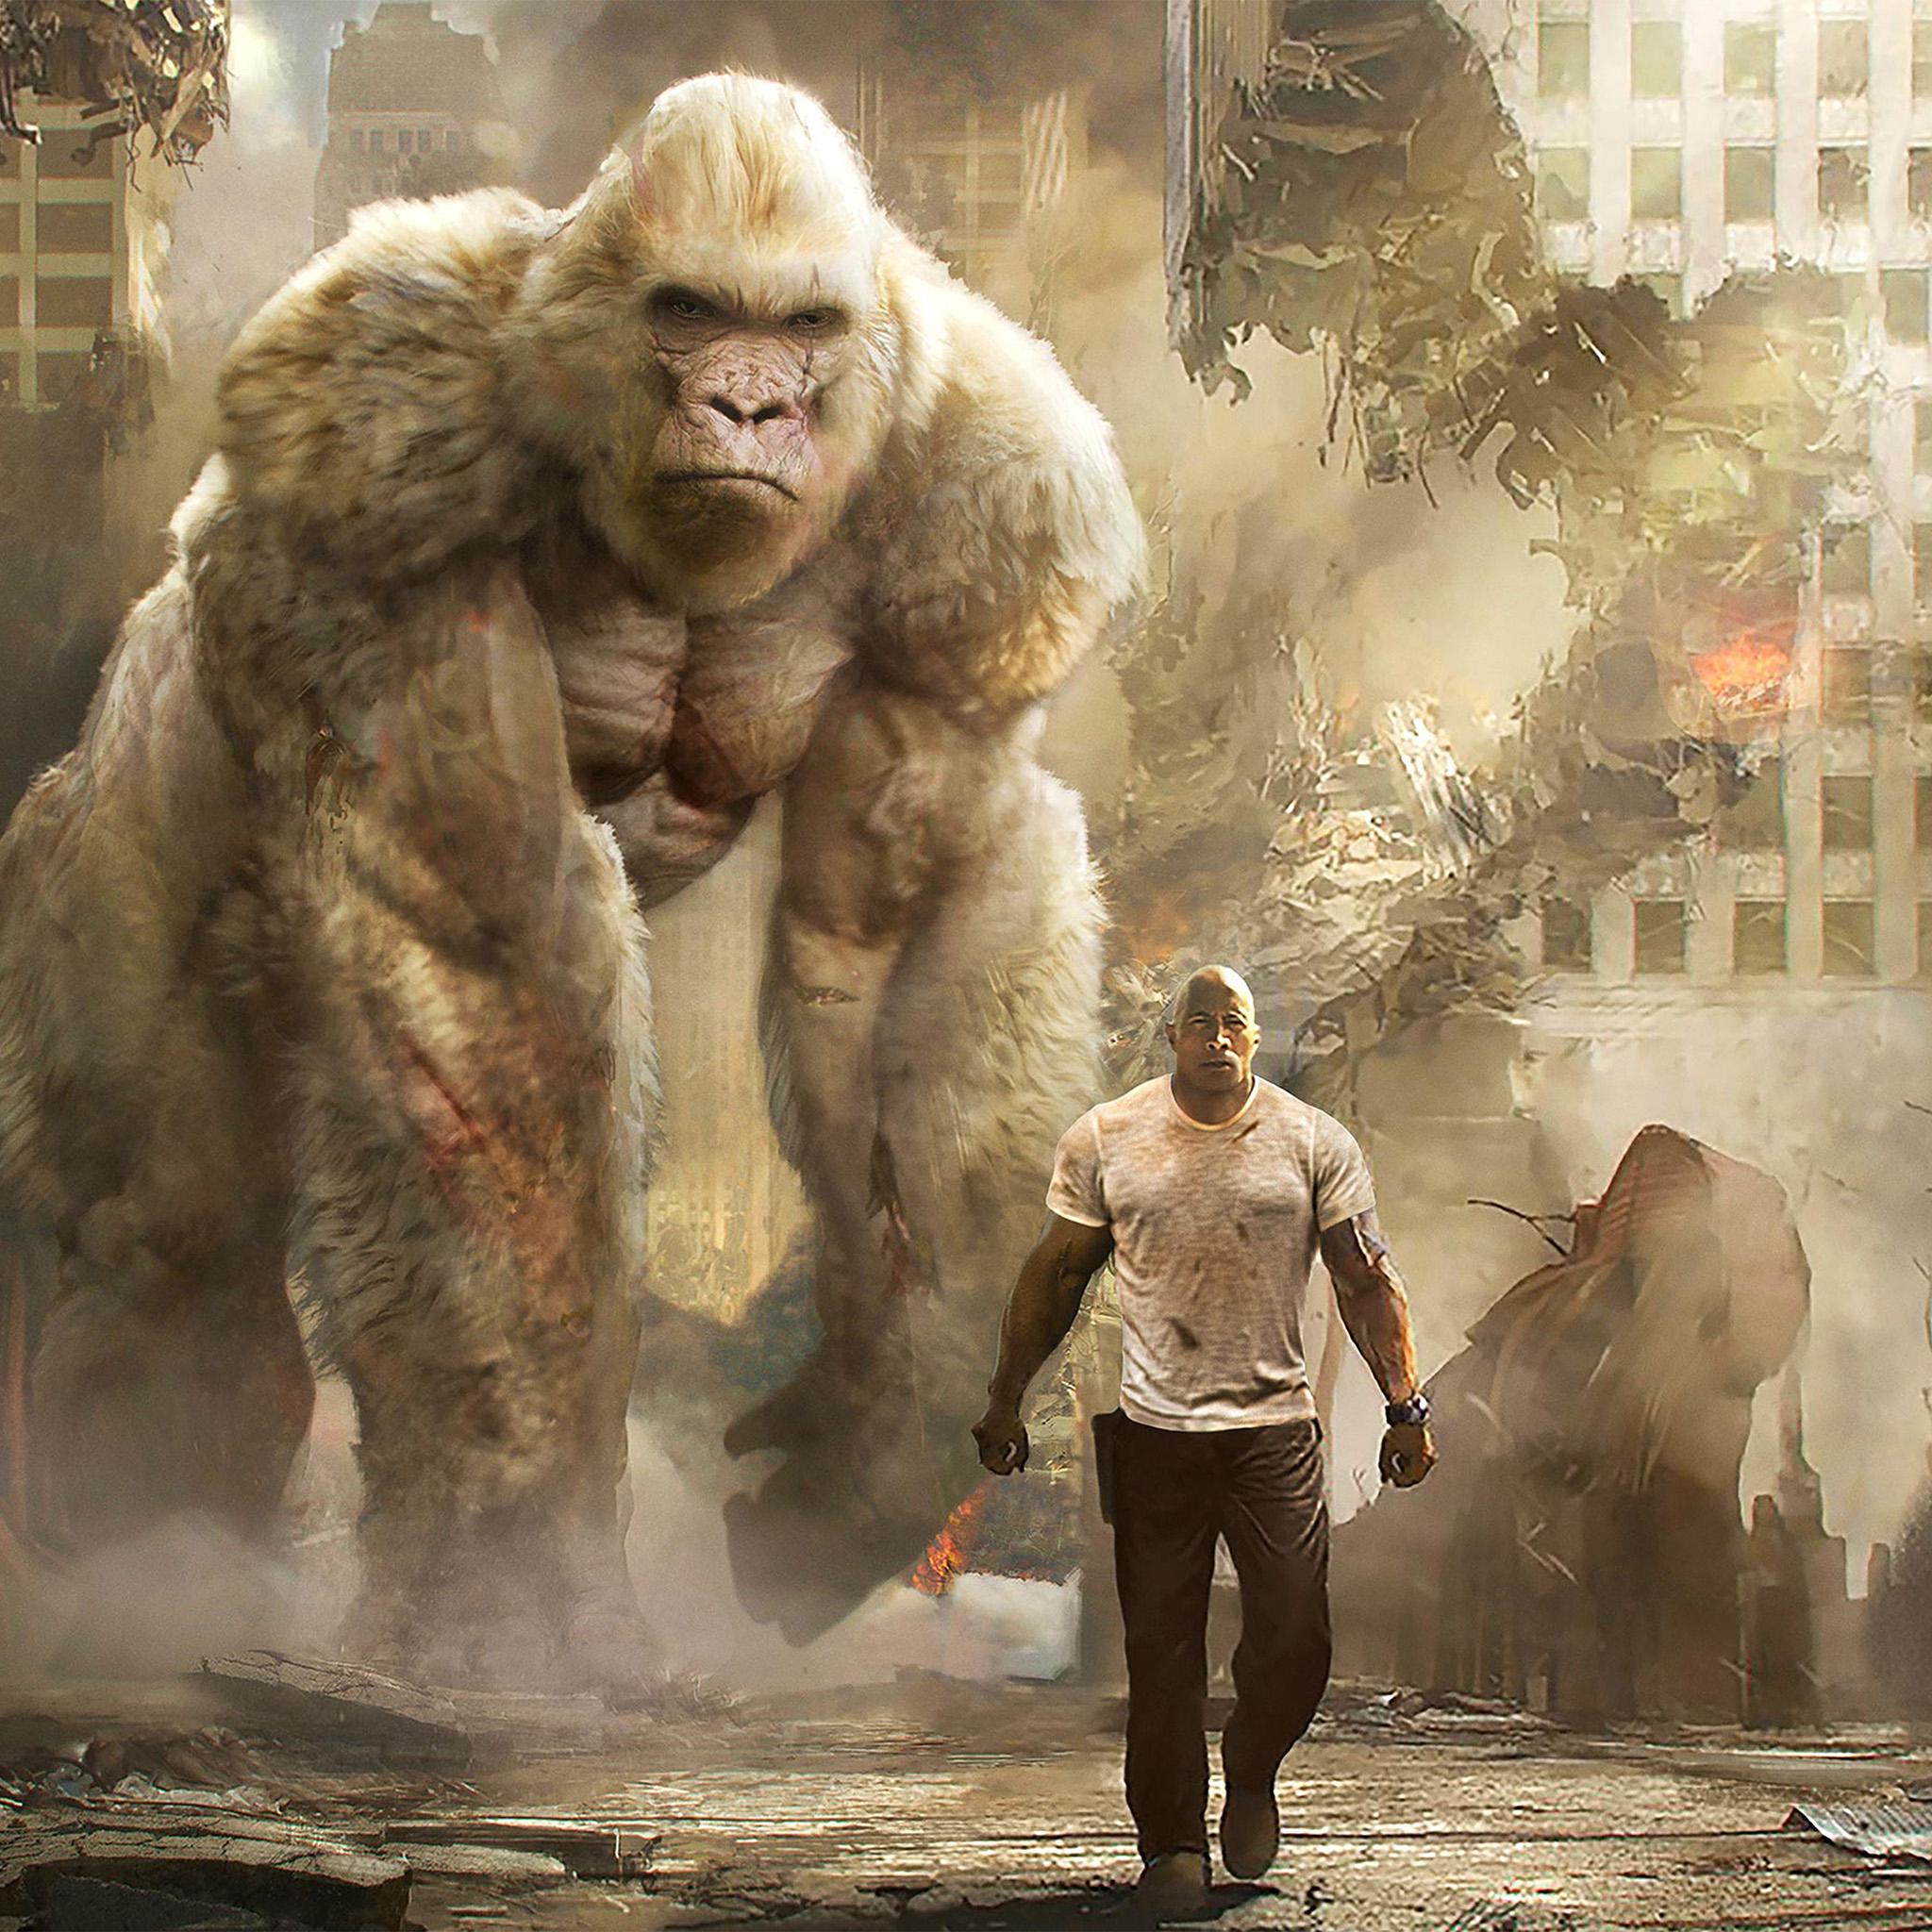 be43-rampage-dwayne-johnson-film-art-illustration-wallpaper